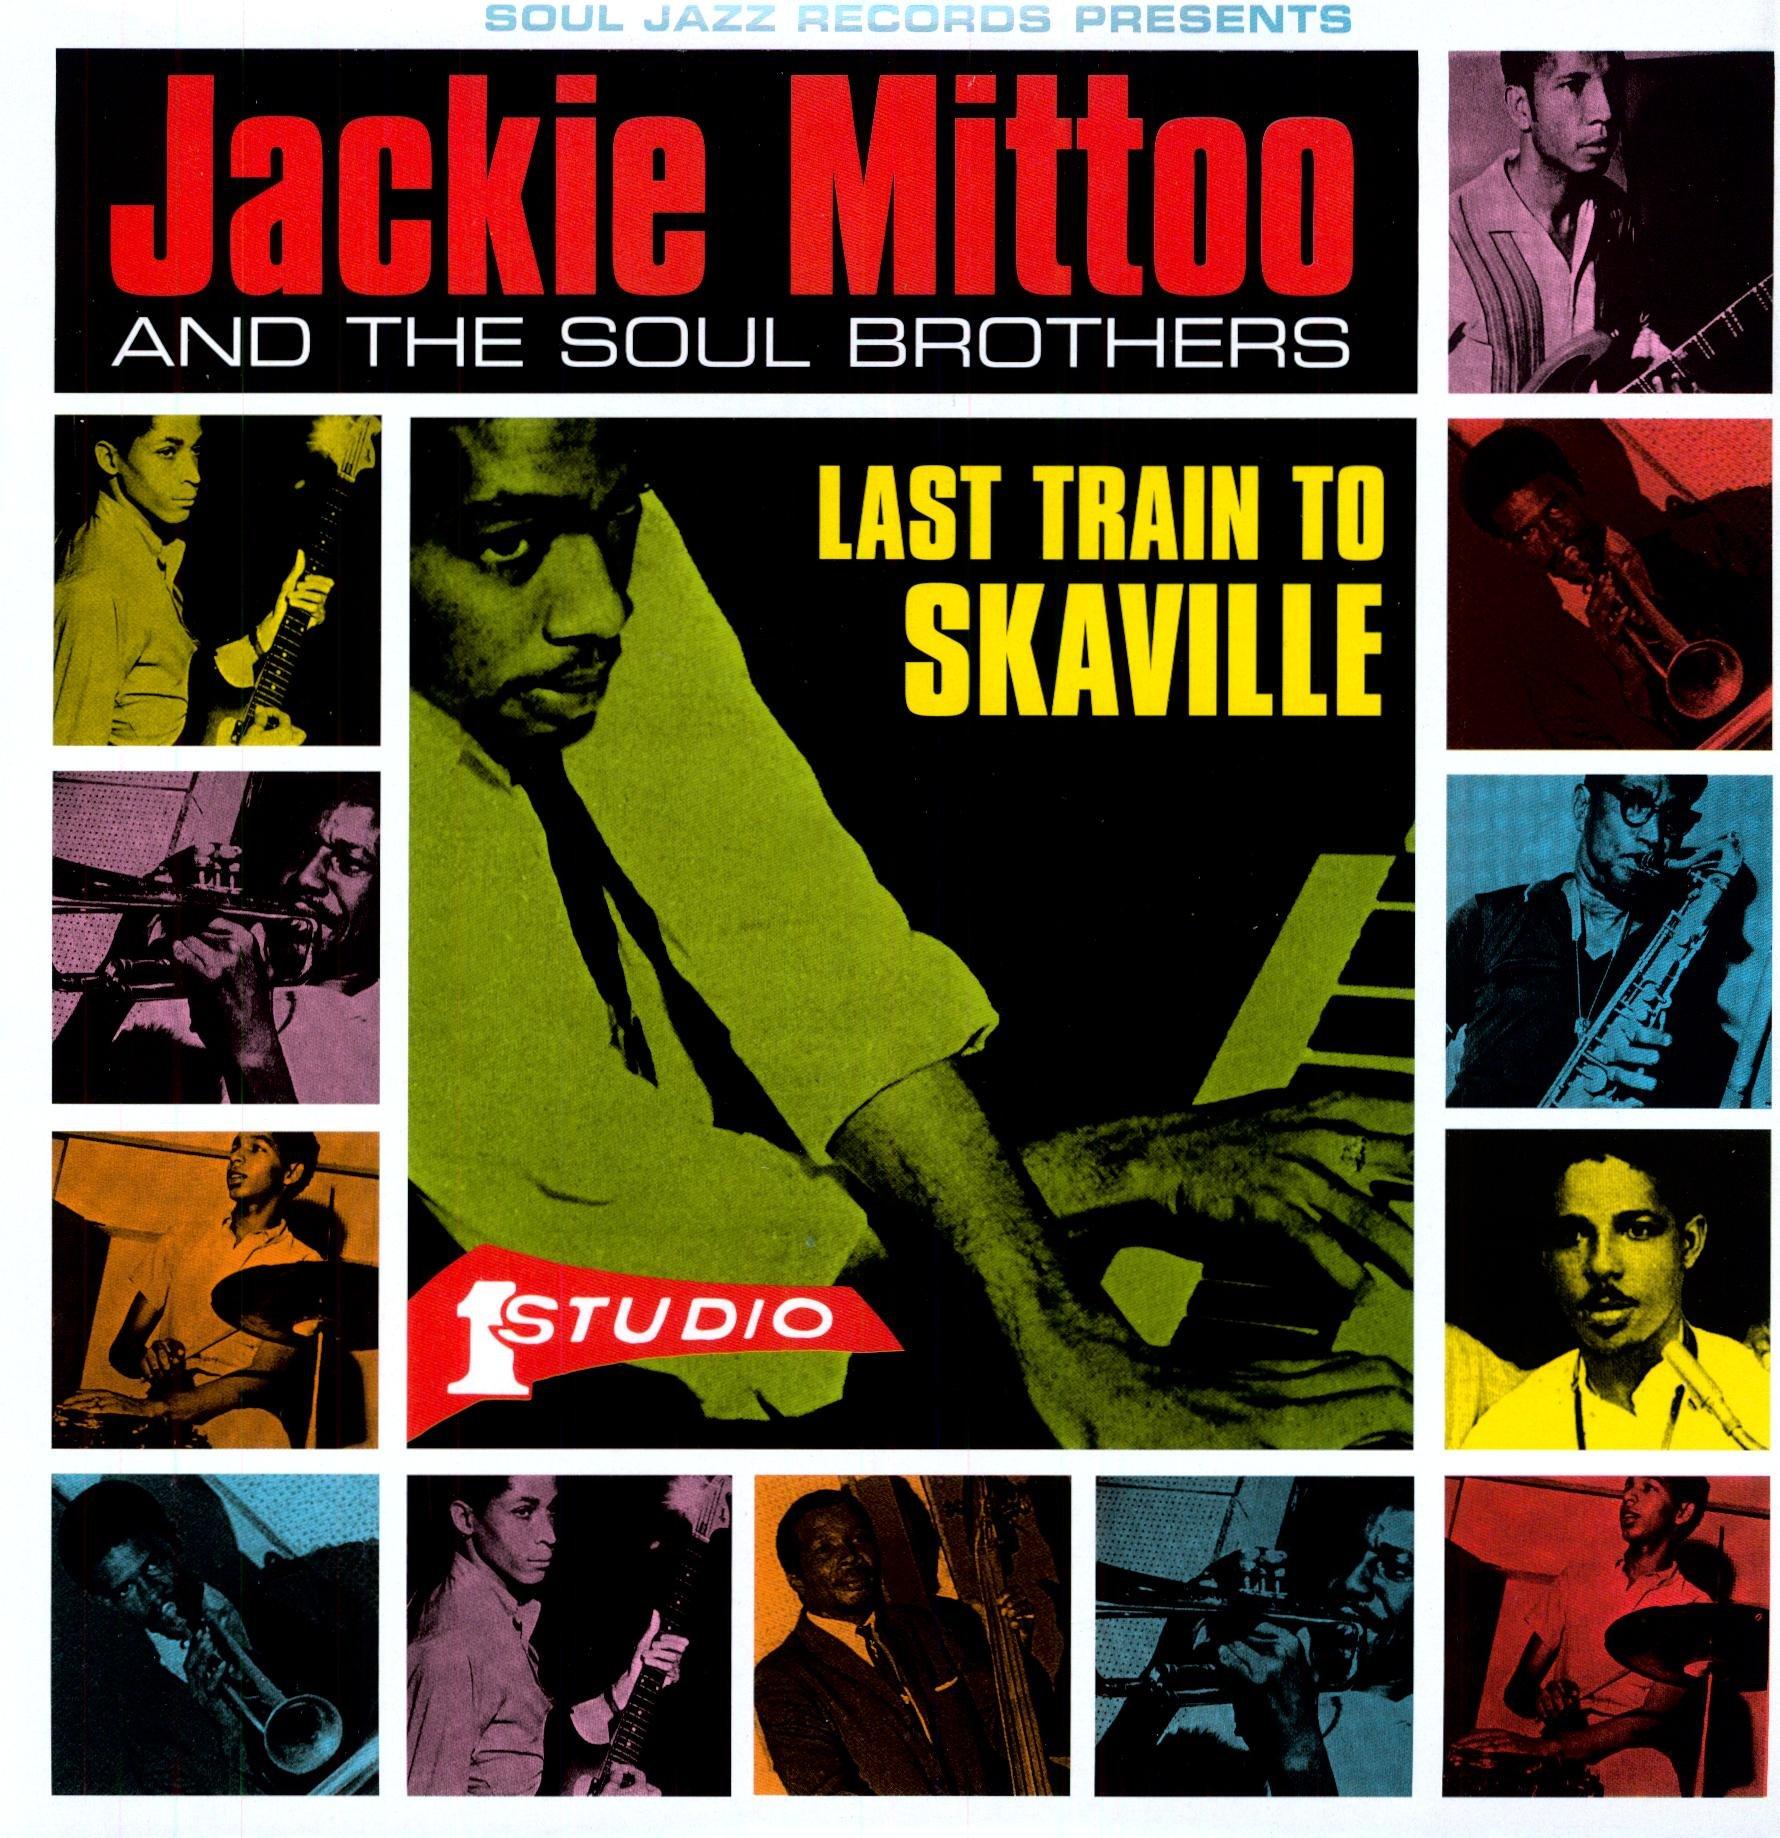 Last Train to Skaville [Vinyl] by Soul Jazz Records